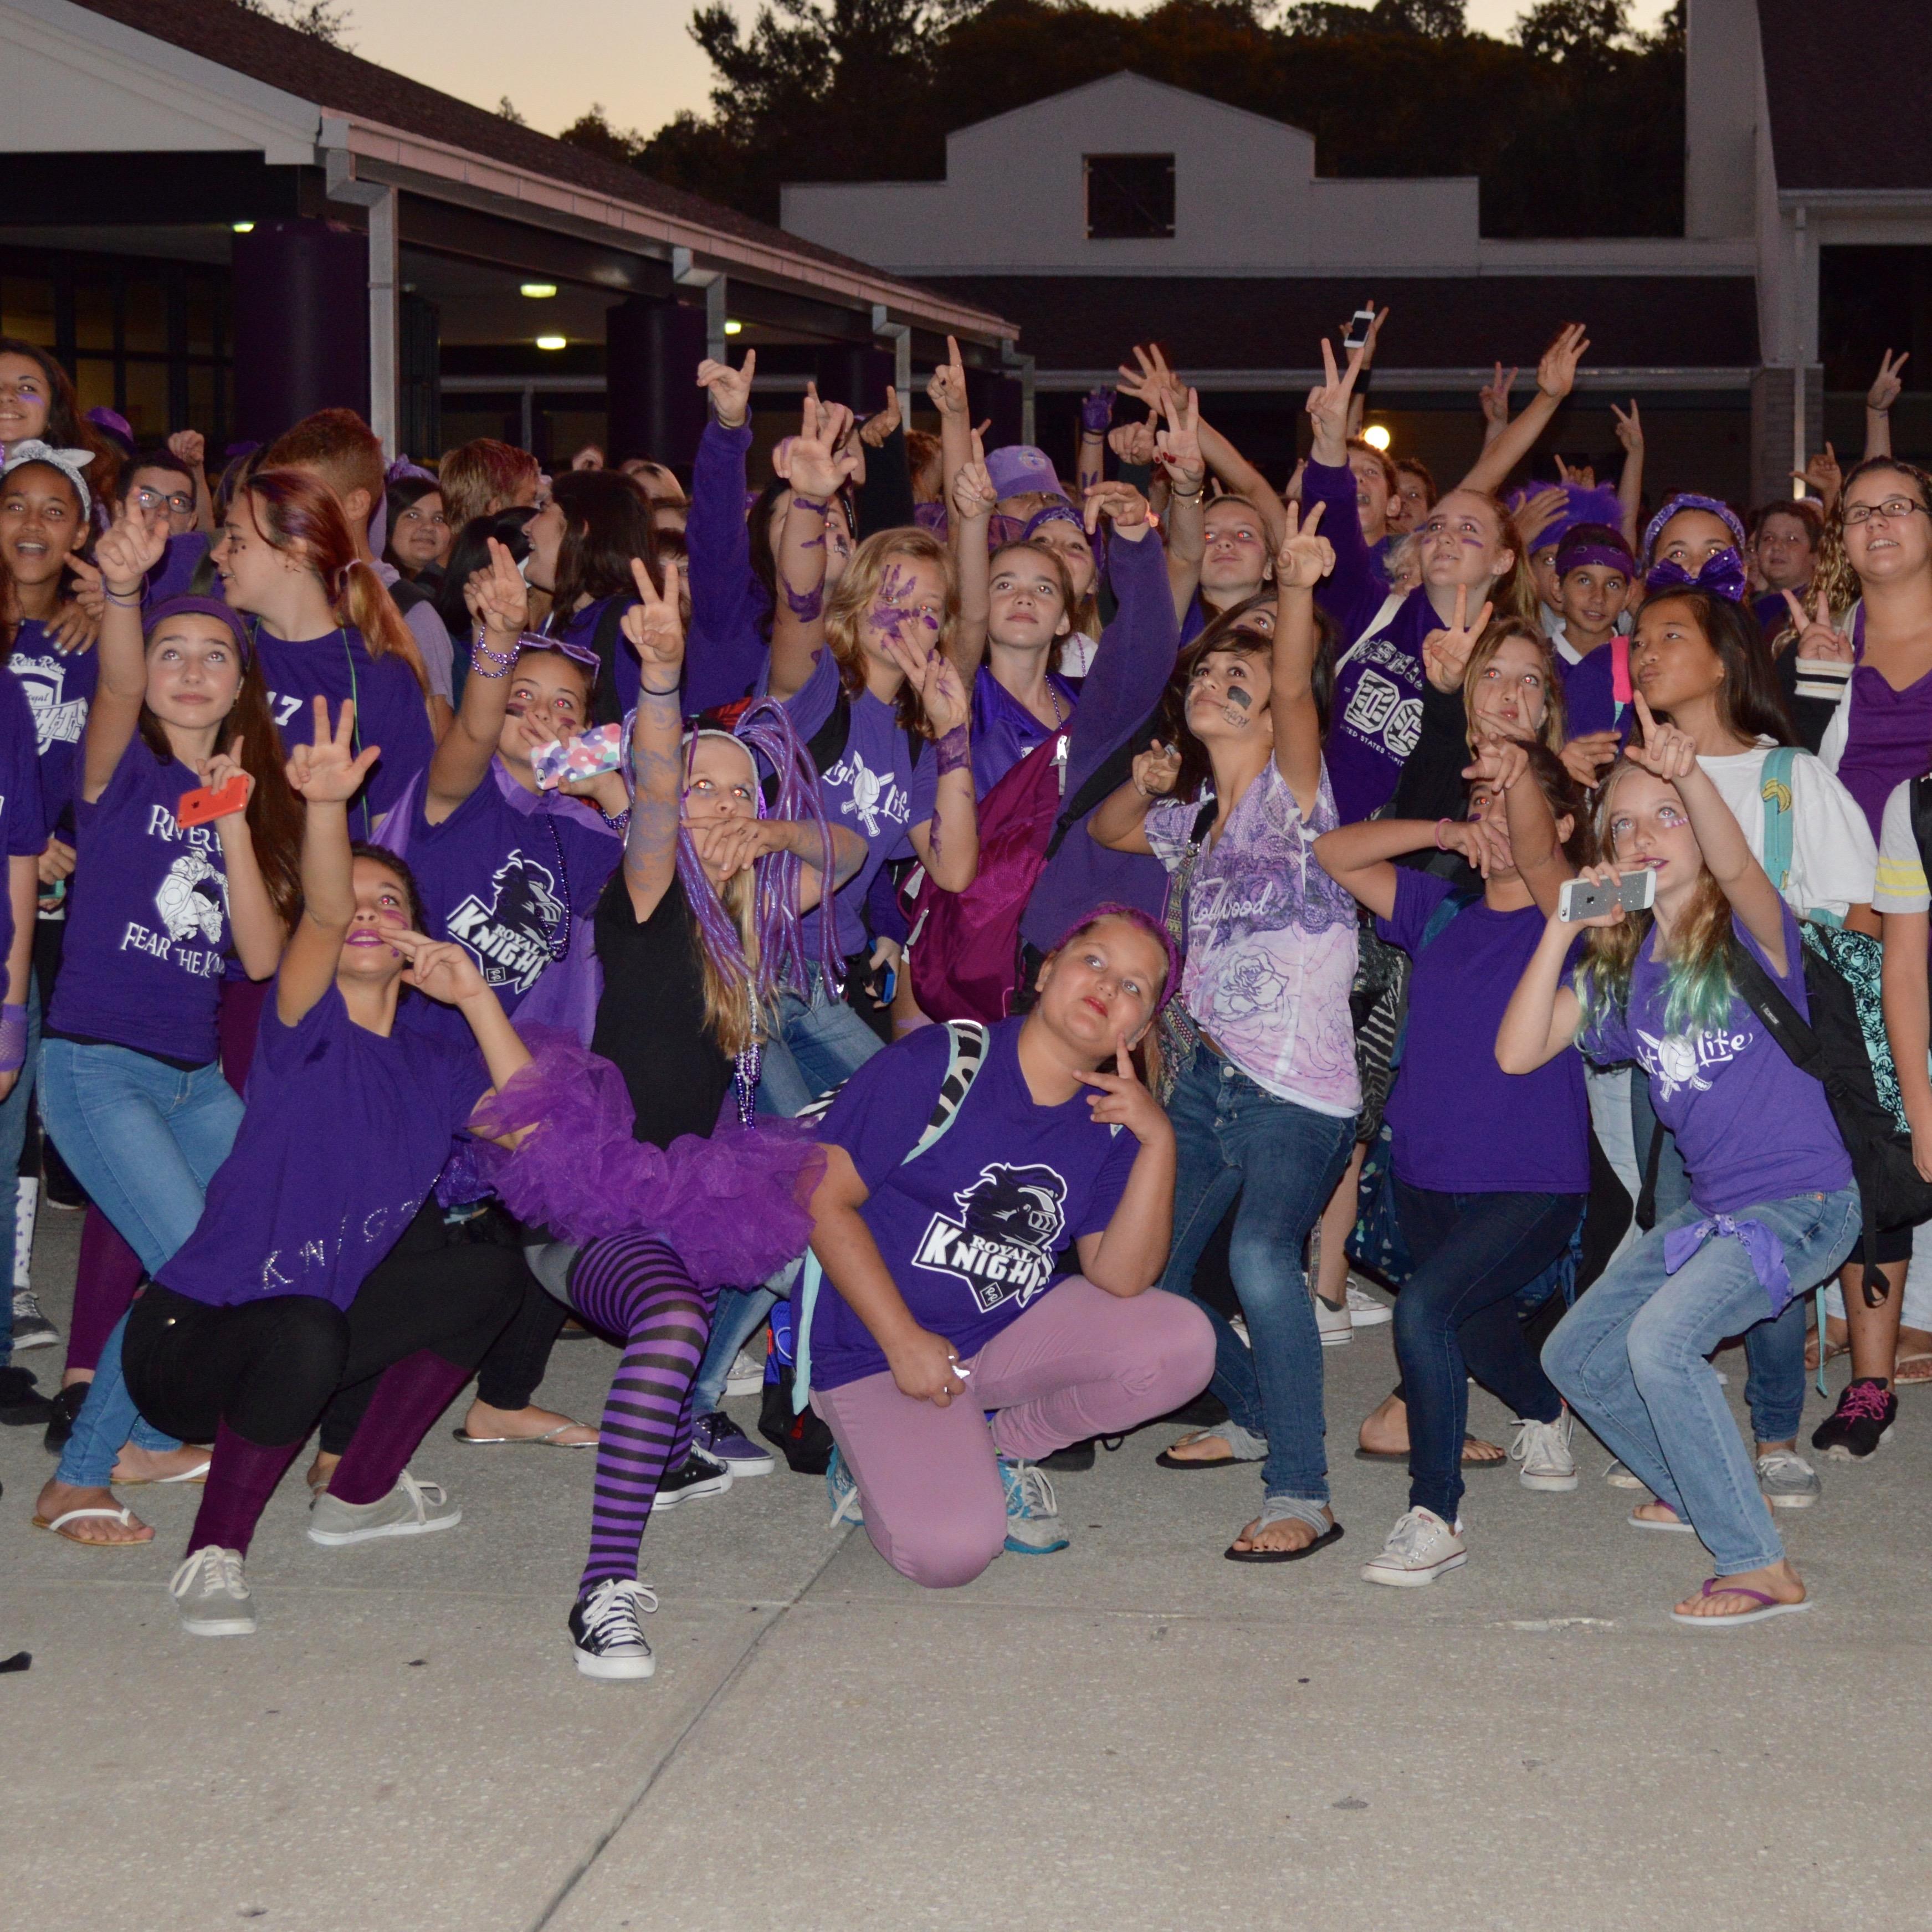 River Ridge Middle School